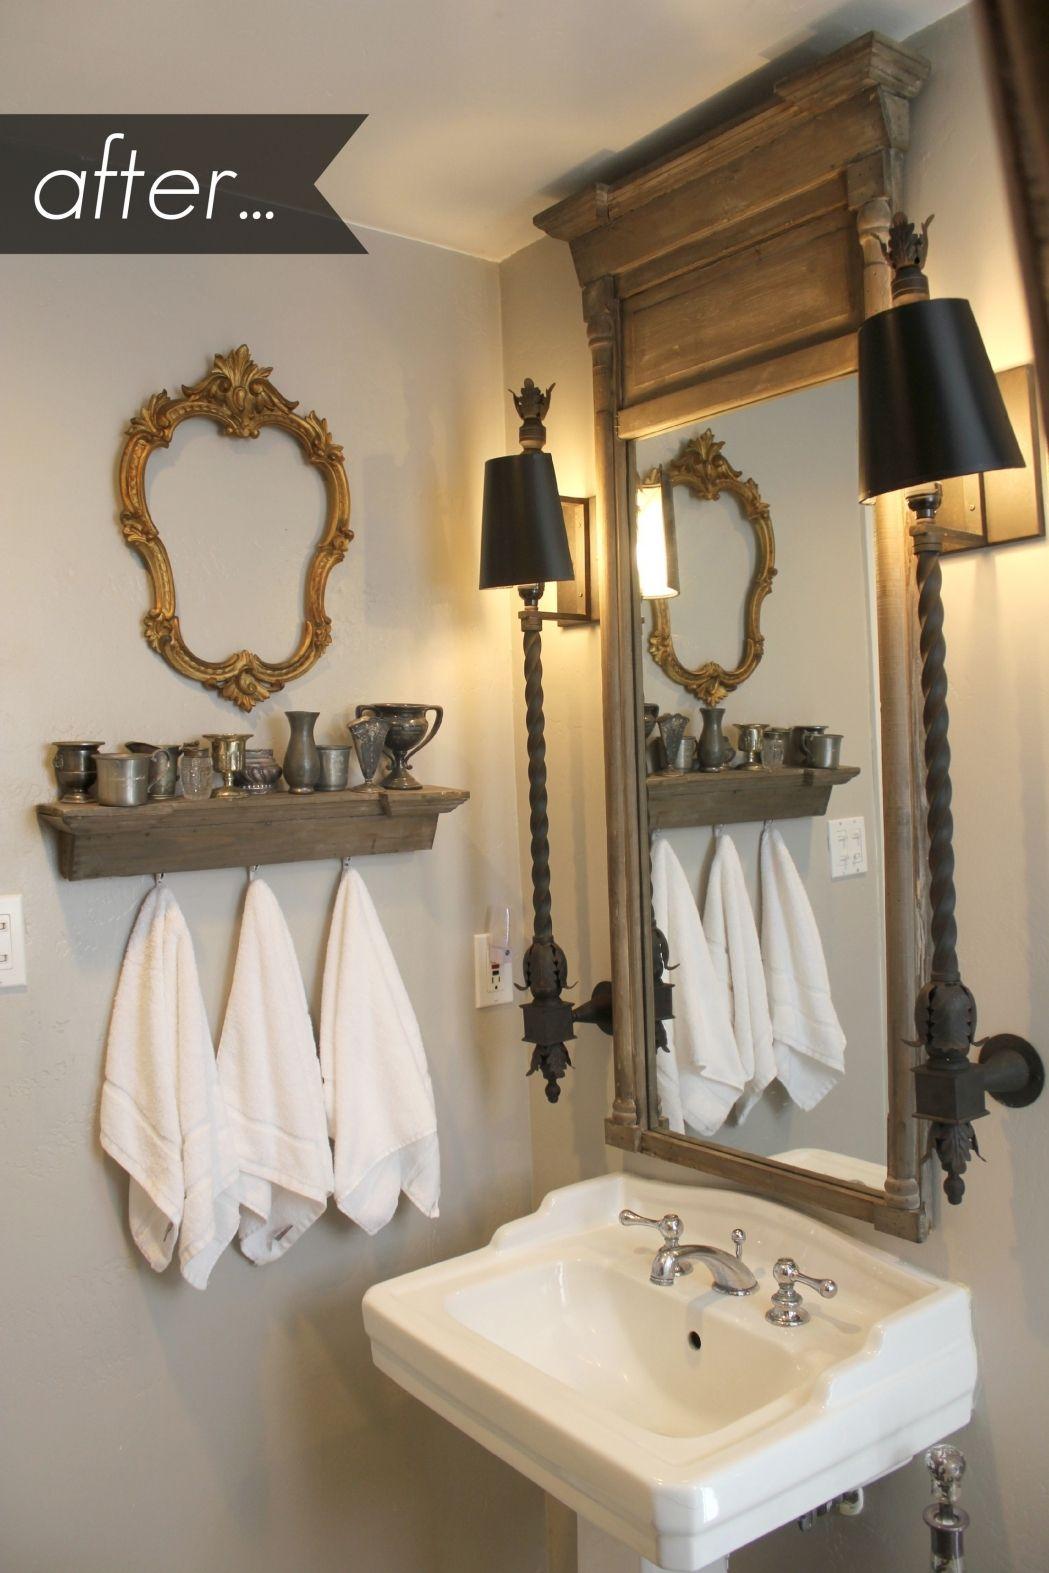 Bathroom mirror ideas to inspire you best bathroom mirrors